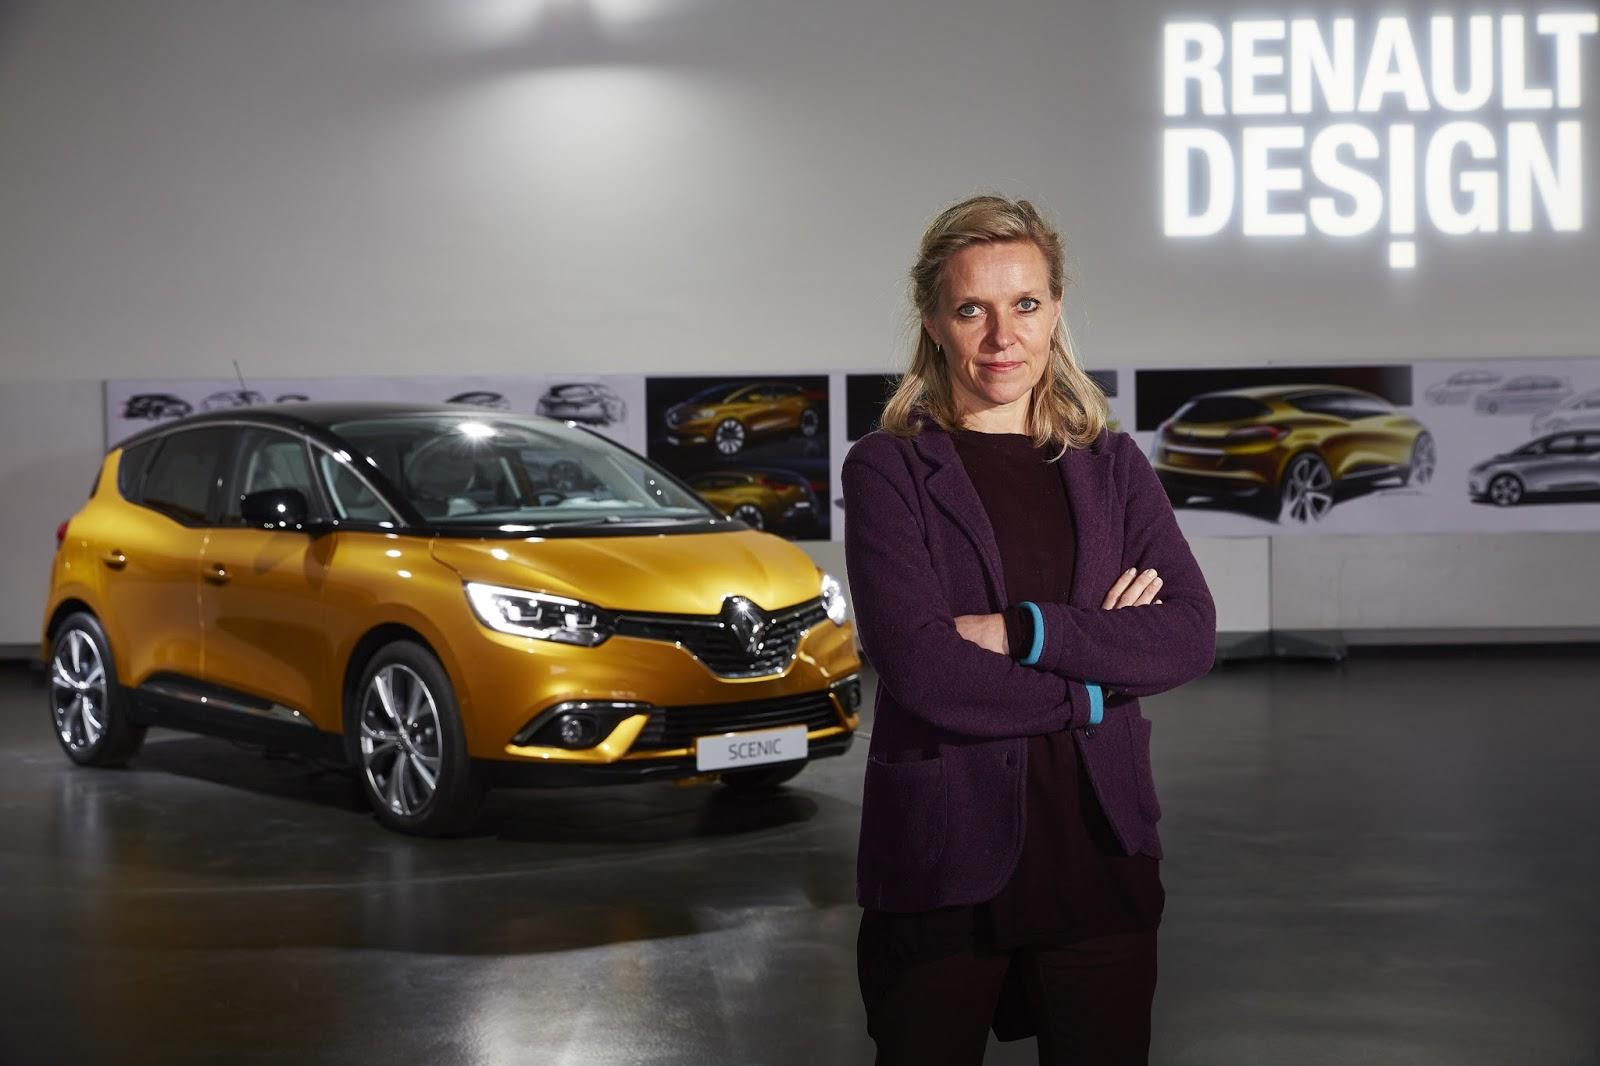 Agneta2BDahlgren2B25262BNew2BSc25C325A9nic 25C225A92BJean Christophe2BMOUNOURY Γυναίκα της χρονιάς η επικεφαλής σχεδιασμού της Renault!